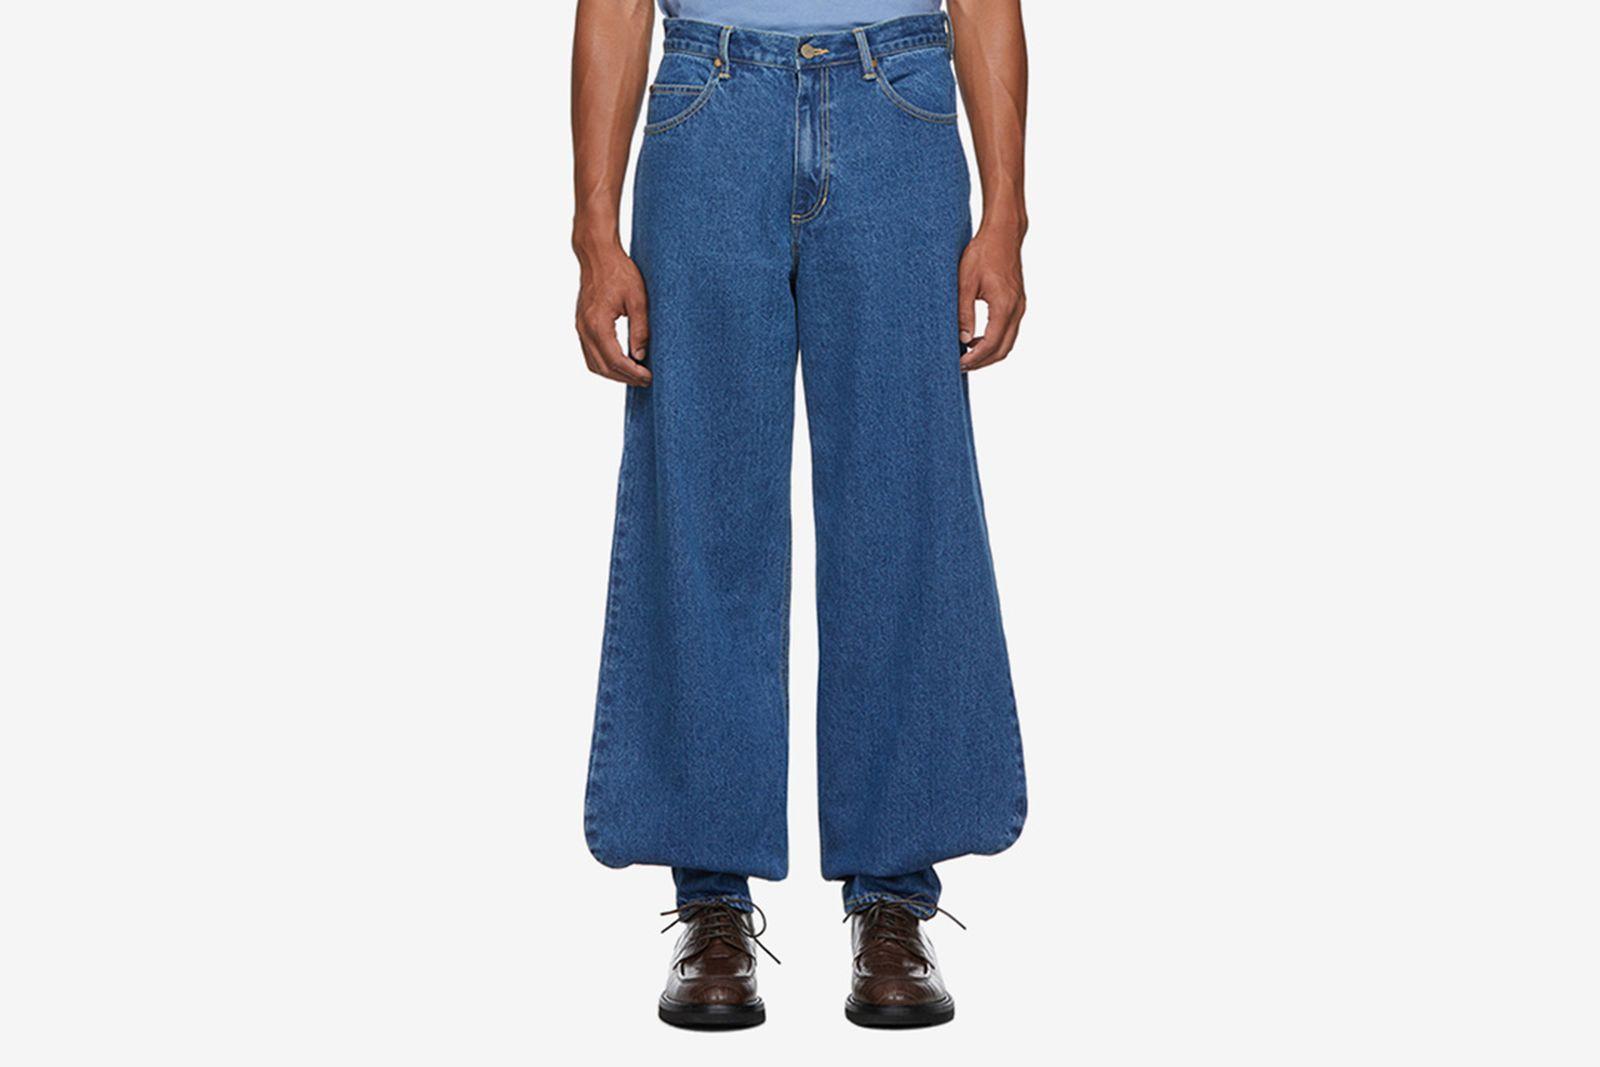 wide leg jeans main ASOS DESIGN GmbH Polar Skate Co.